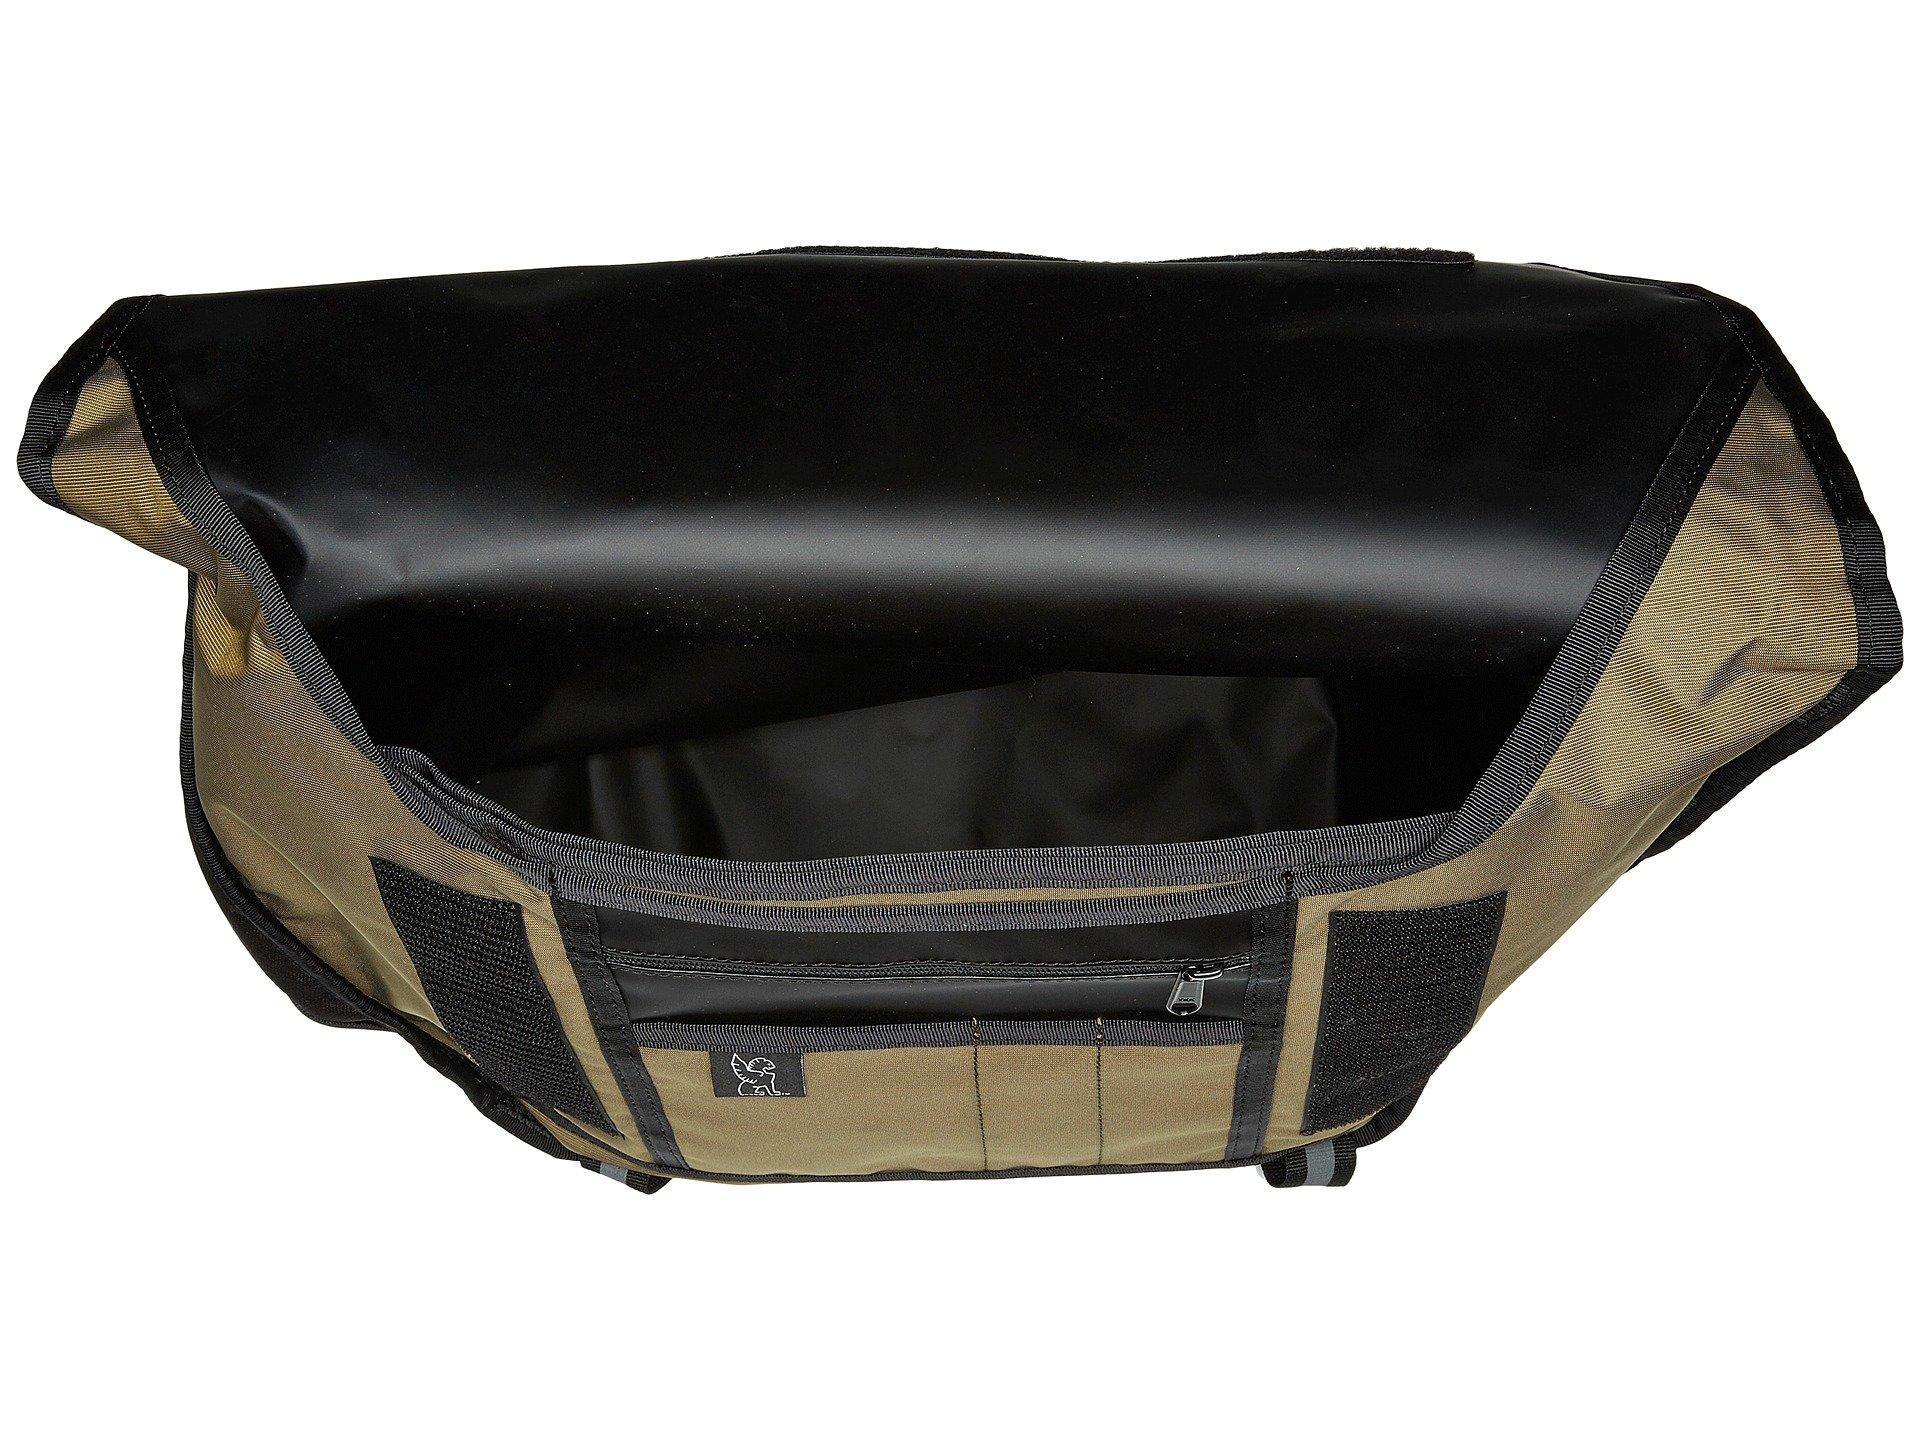 Ranger Chrome Welterweight Mini black Metro qwOtTOX